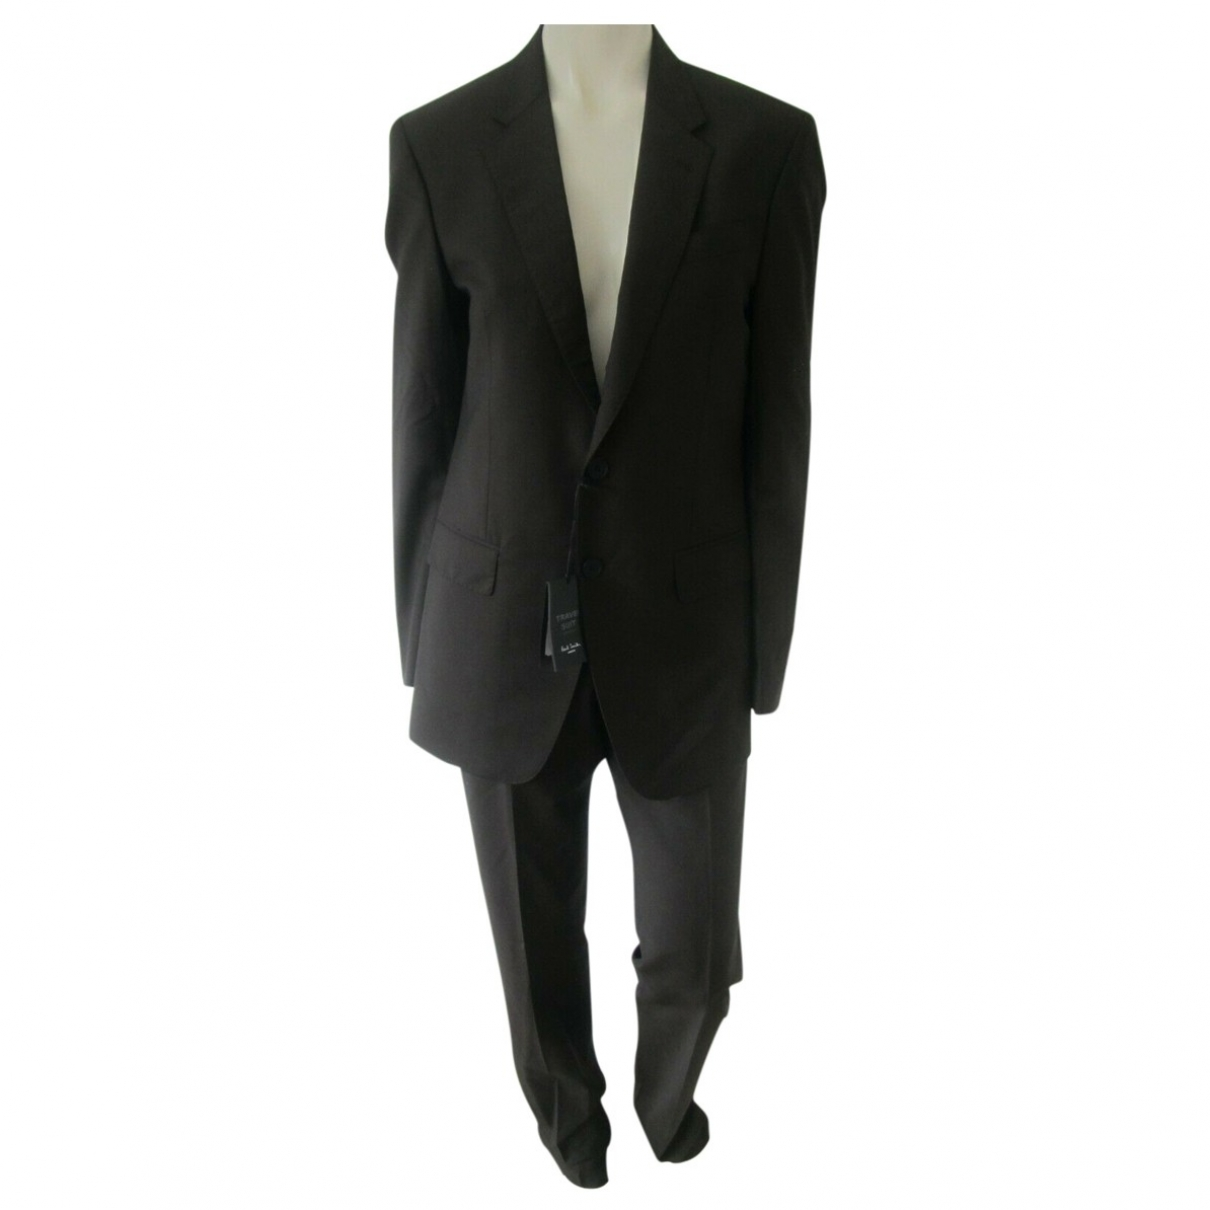 Paul Smith \N Brown Wool Suits for Men 36 UK - US